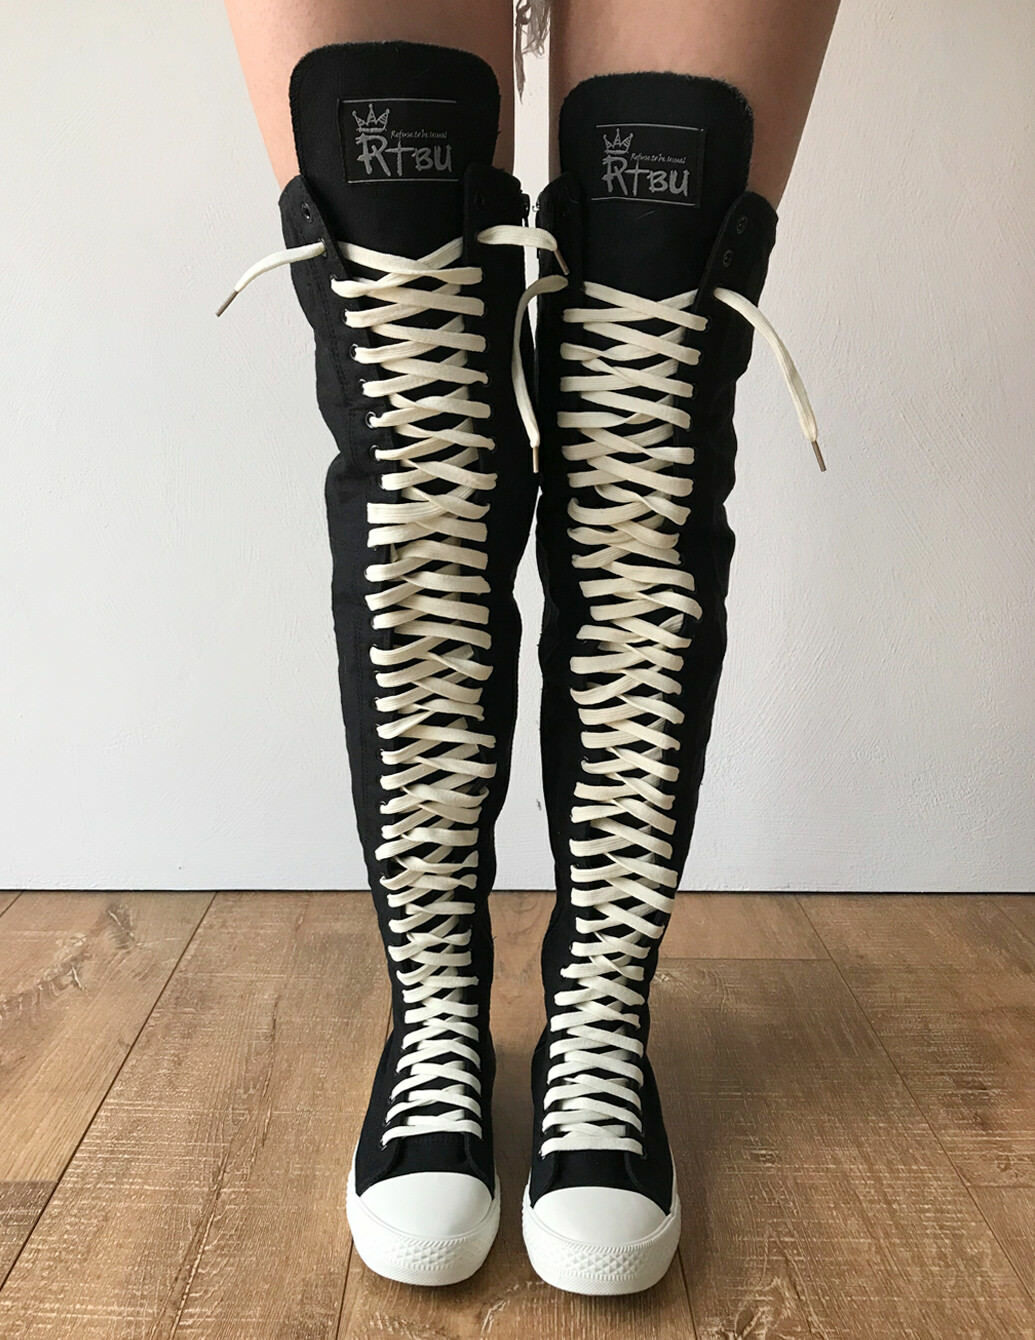 Garanzia del prezzo al 100% RTBU Ivory Ivory Ivory Frosting 35 Hole Punk Thigh Hi bianca Lace Canvas Lace Up scarpe da ginnastica avvio  più ordine